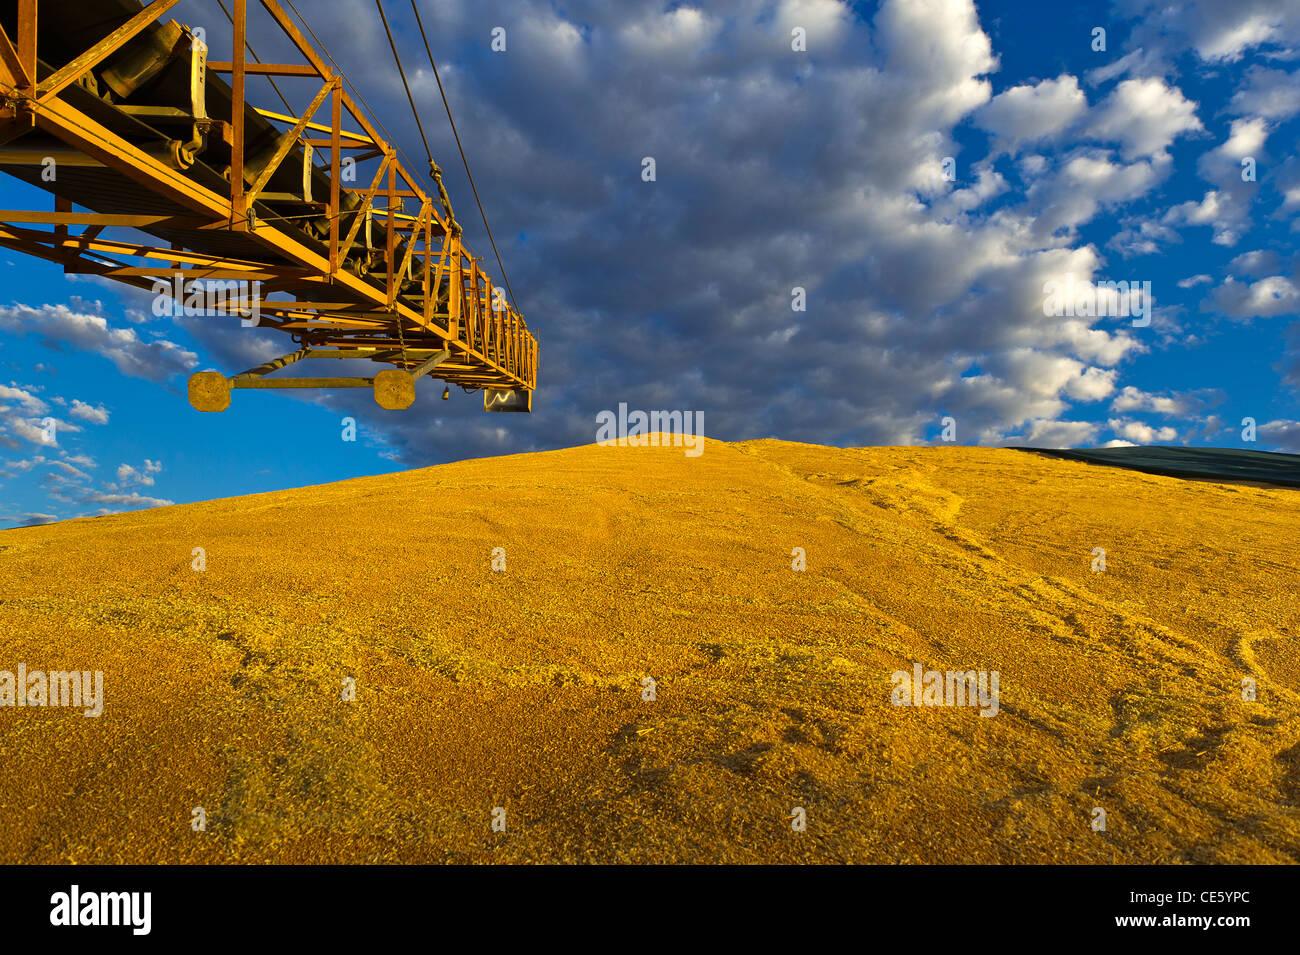 Pile of wheat, Emerald QLD Australia - Stock Image